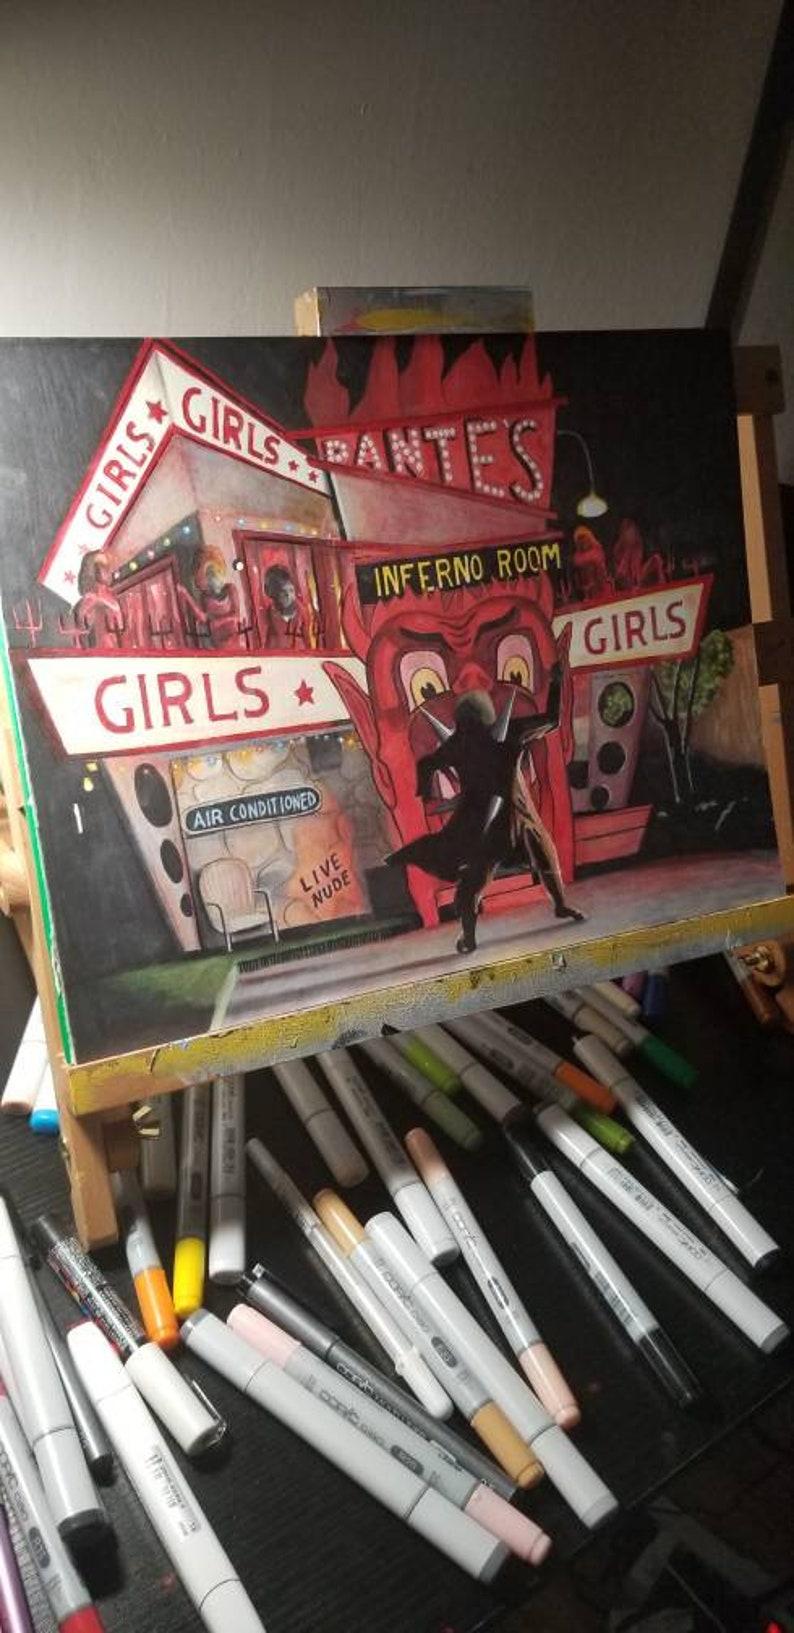 Beetlejuice Inferno Room 11x14 art print.